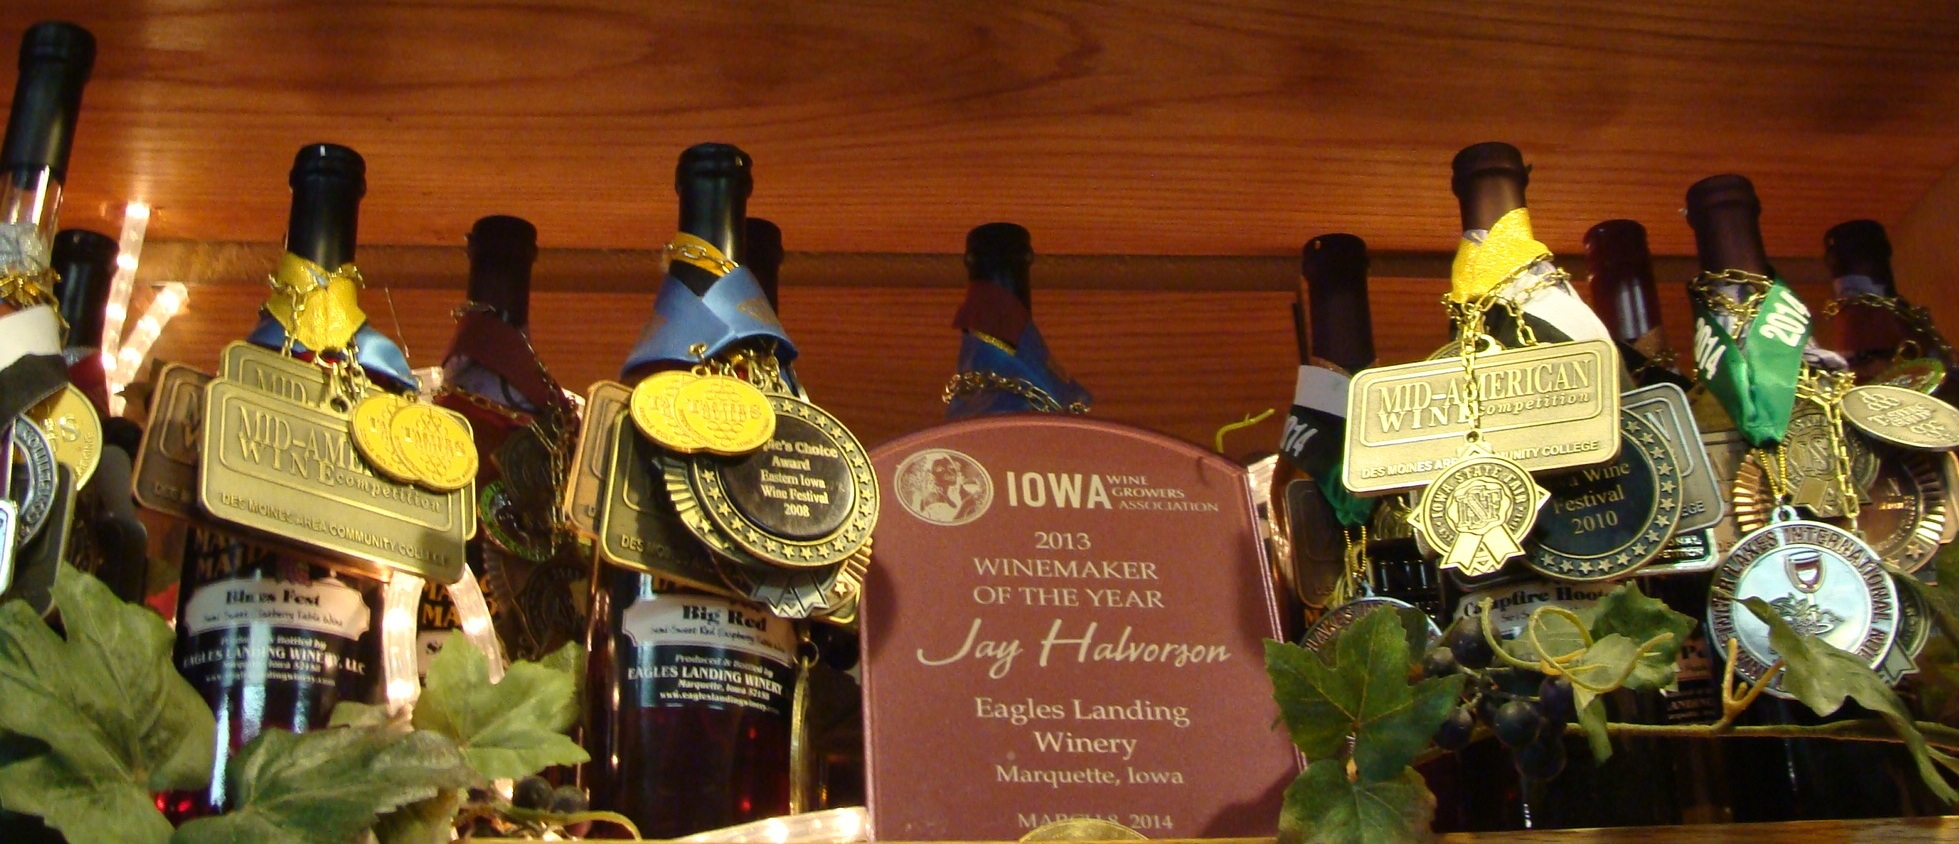 Eagles Landing Winery